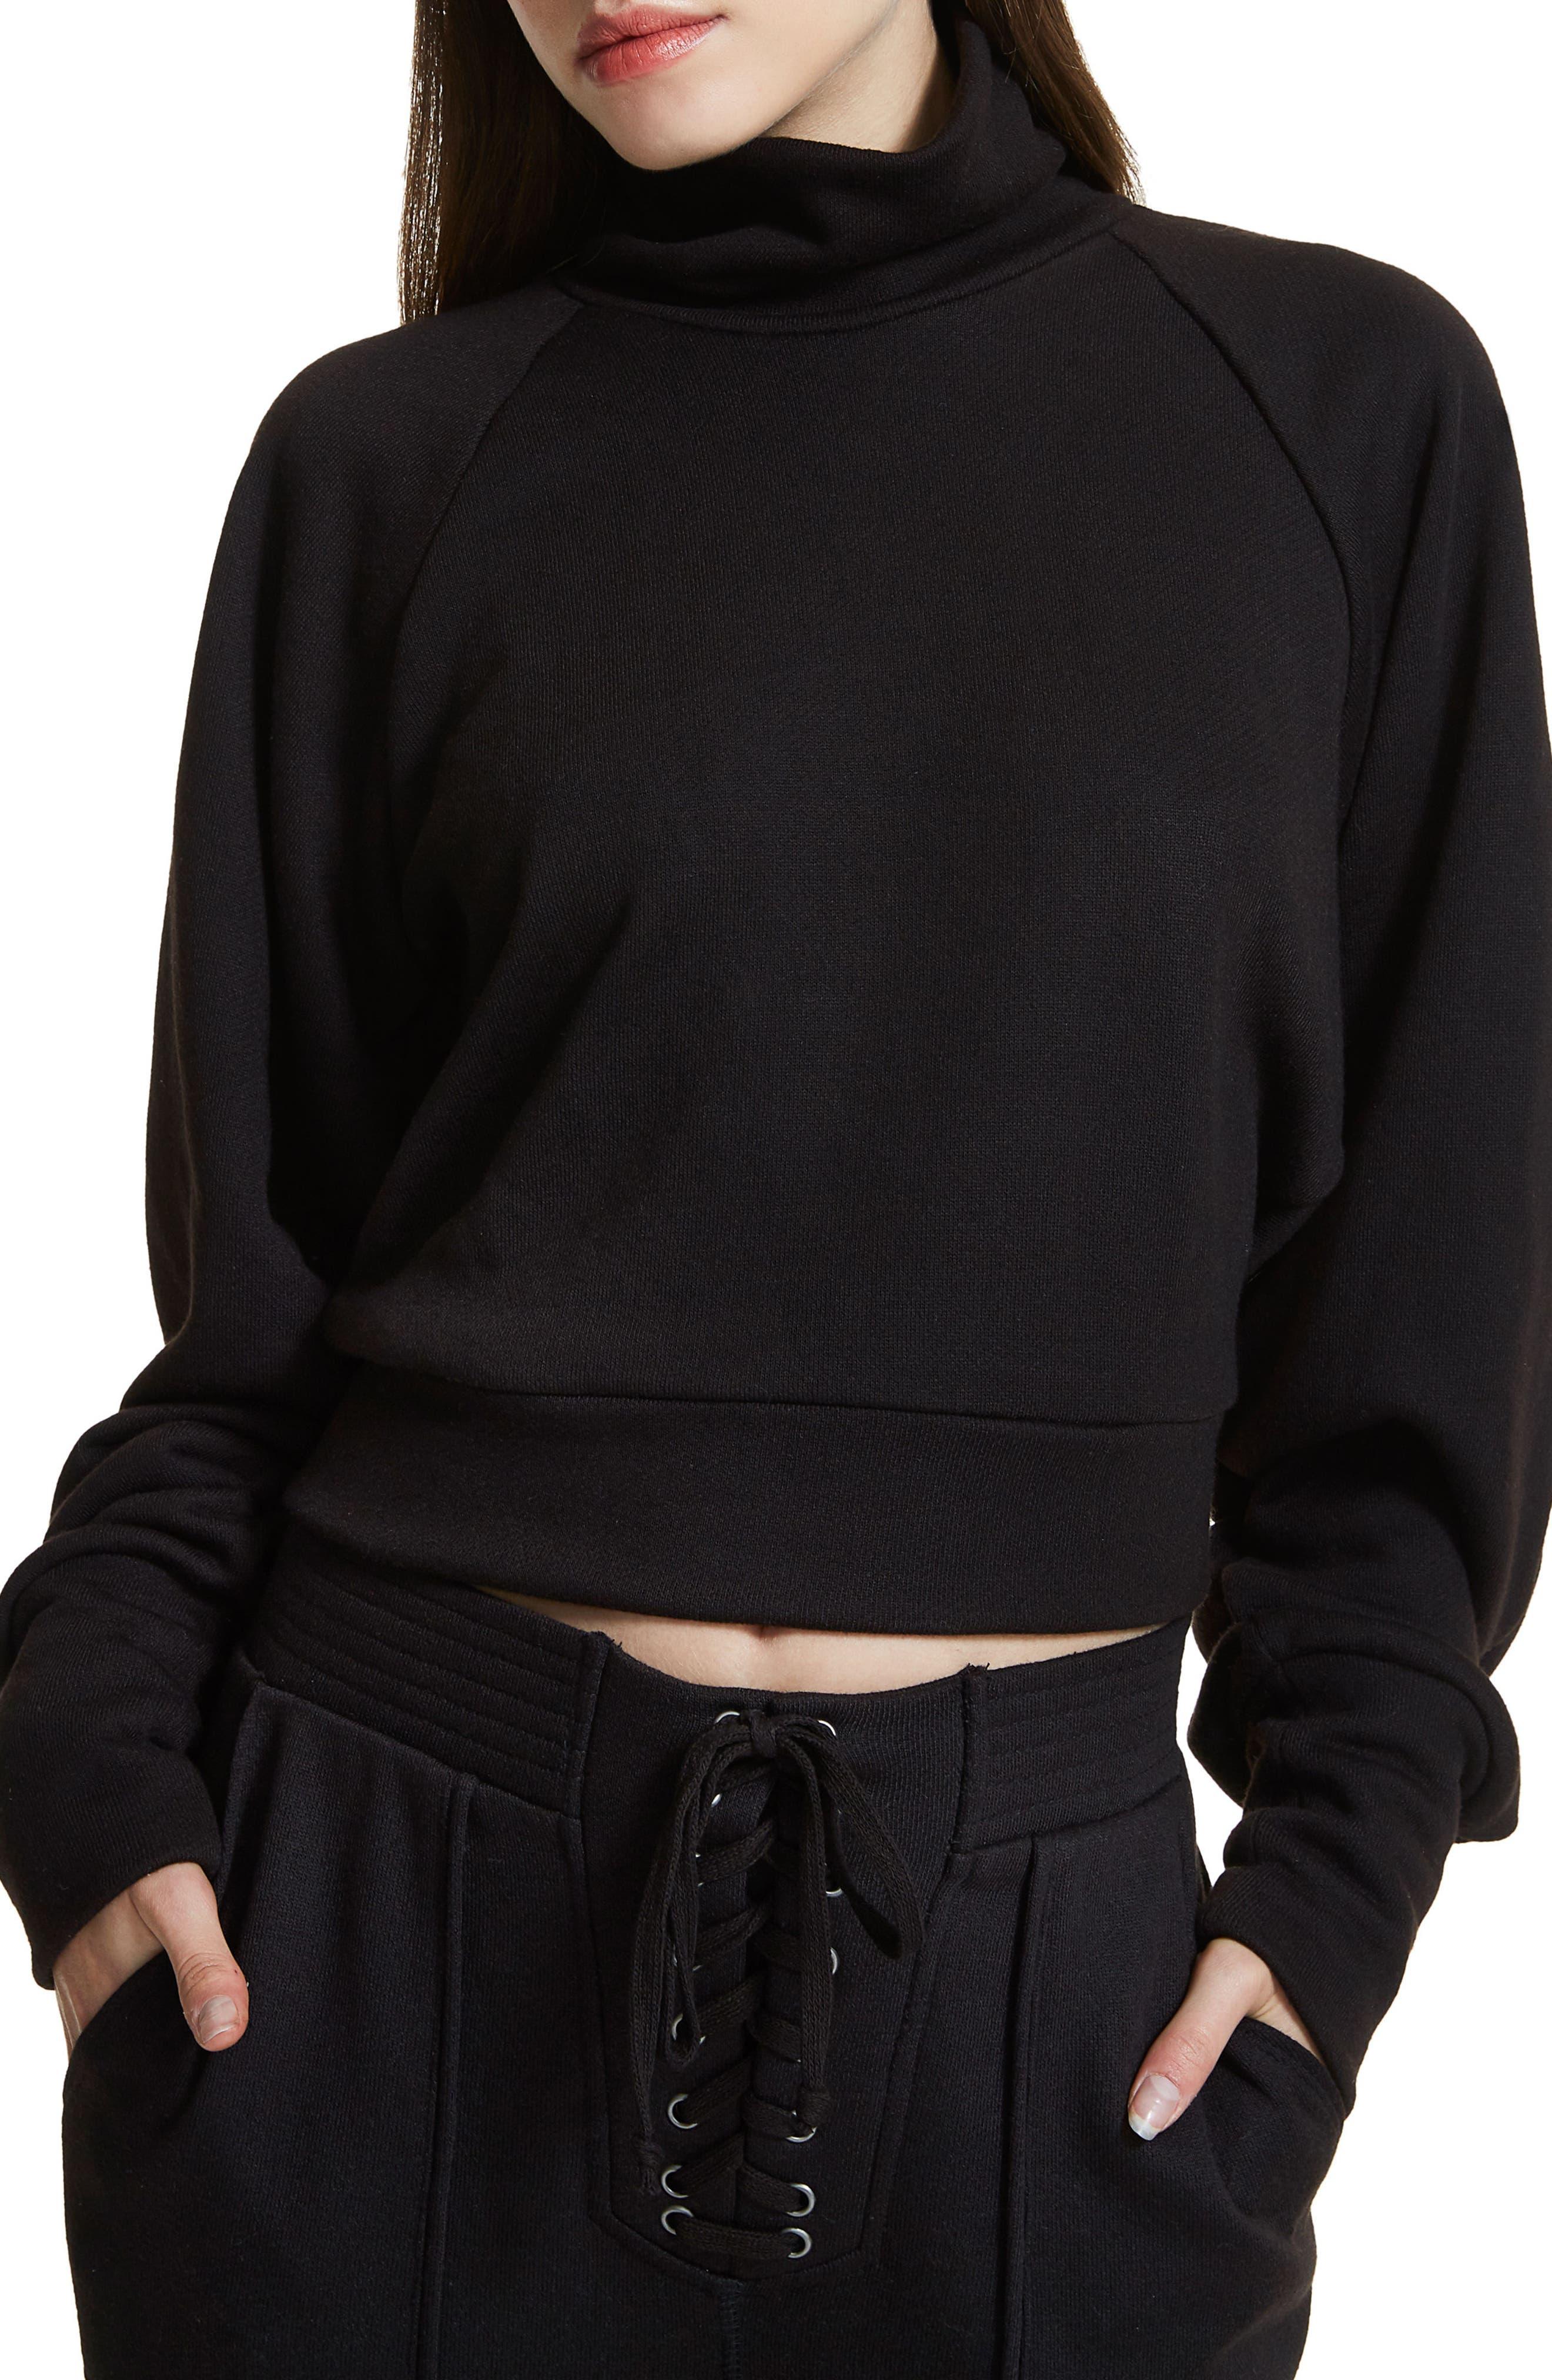 Alternate Image 1 Selected - AFRM Jaxon Crop Turtleneck Sweatshirt